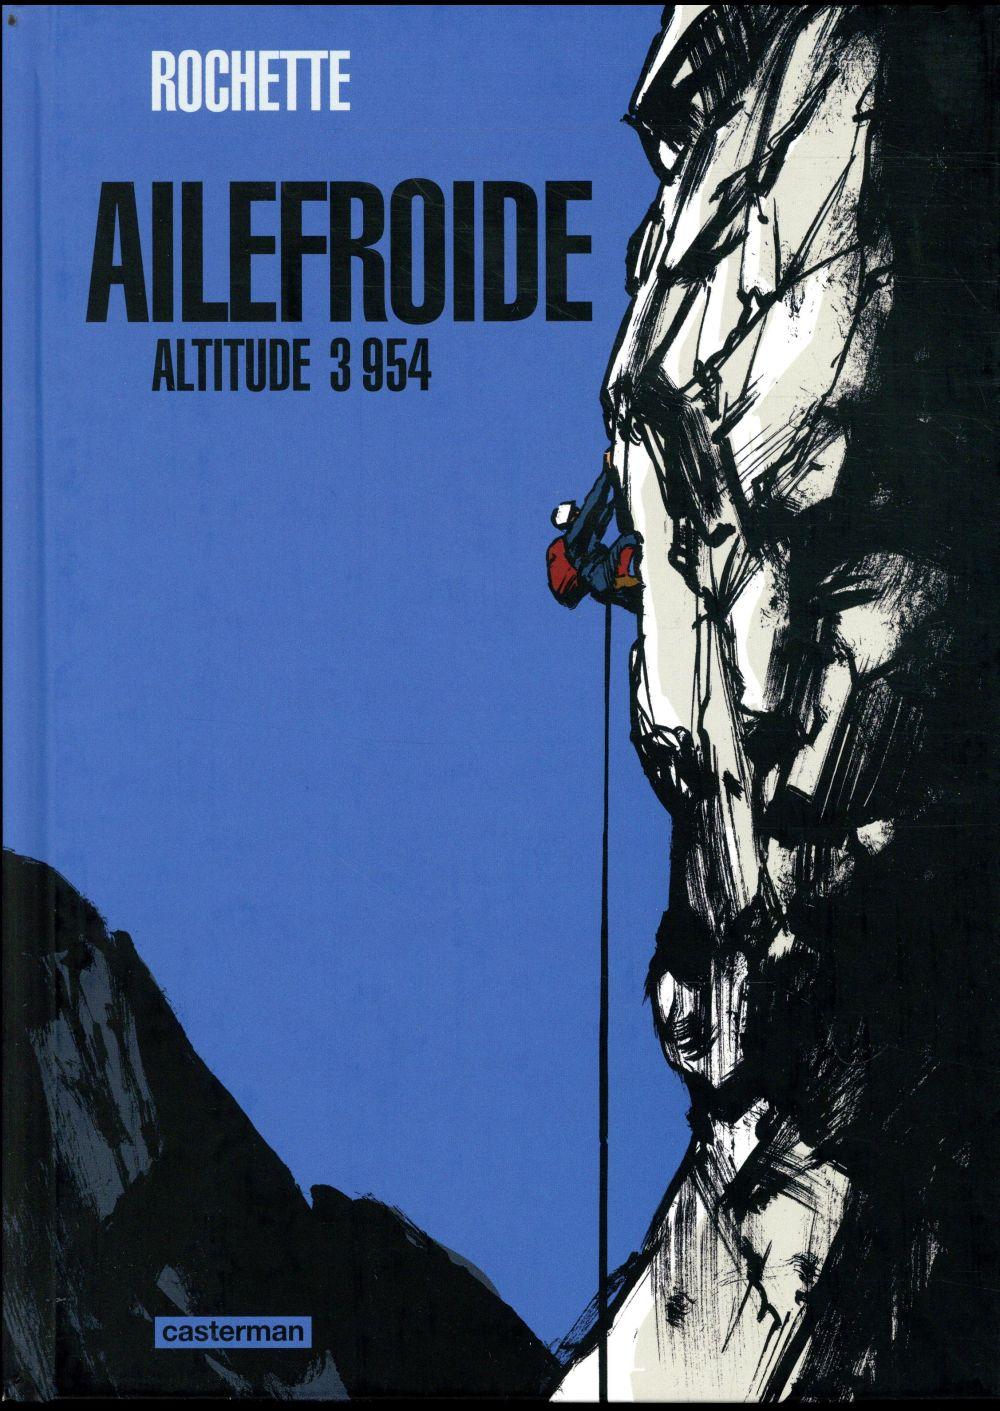 AILEFROIDE - ALTITUDE 3954 ROCHETTE/BOCQUET/REY CASTERMAN